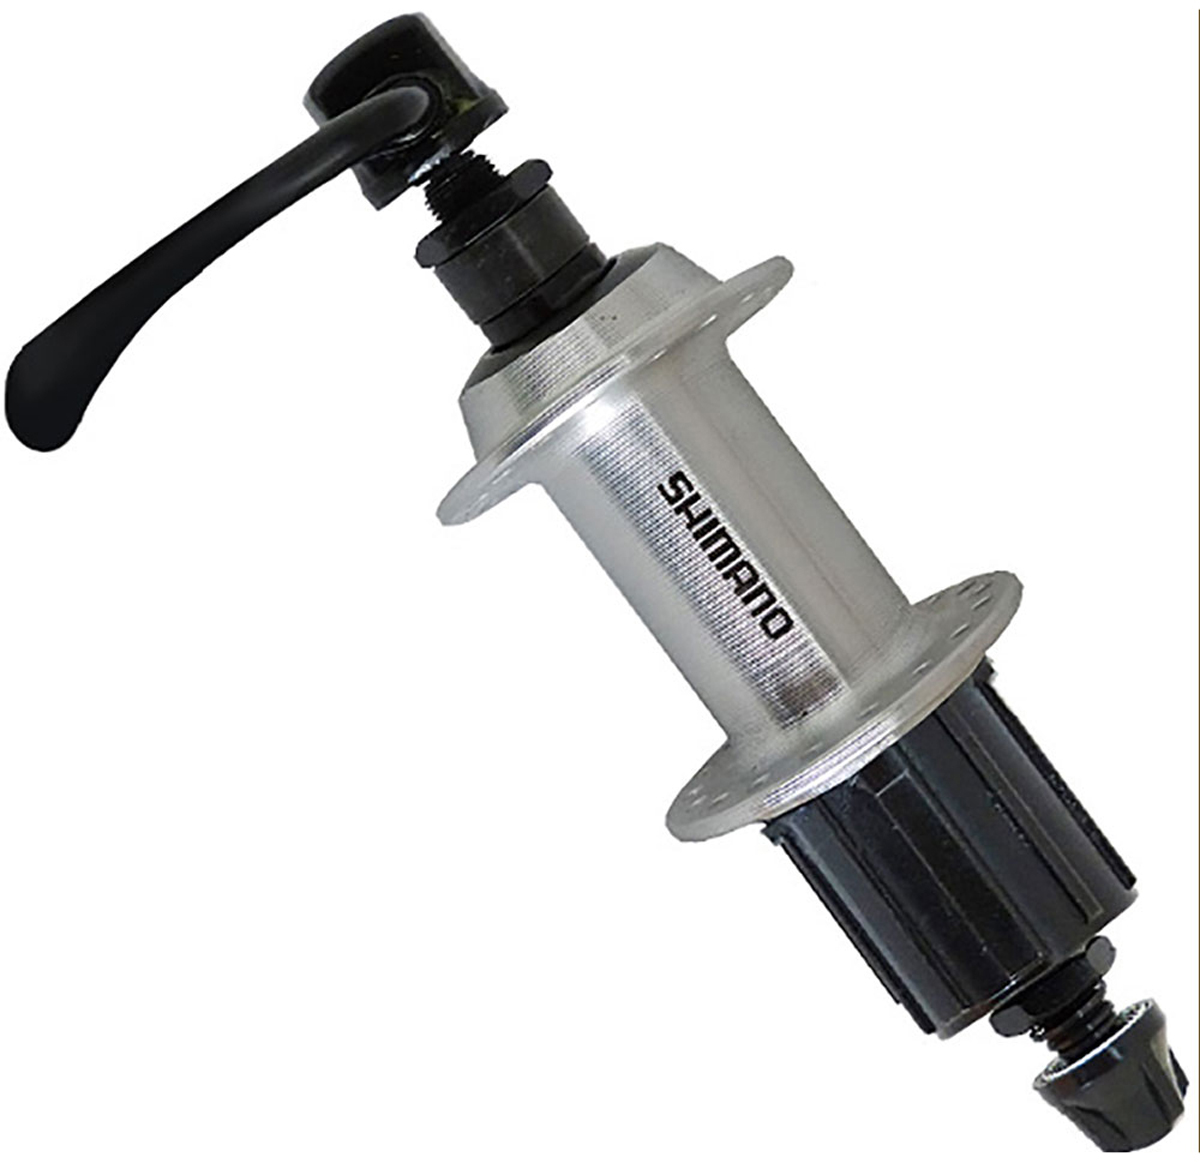 Втулка задняя Shimano TX500, v-br, 36 отверстий, 8/9ск, QR, old: 135 мм, цвет: серебристый втулка задняя ride trail qr 32h 135 мм синий rrt32135bl